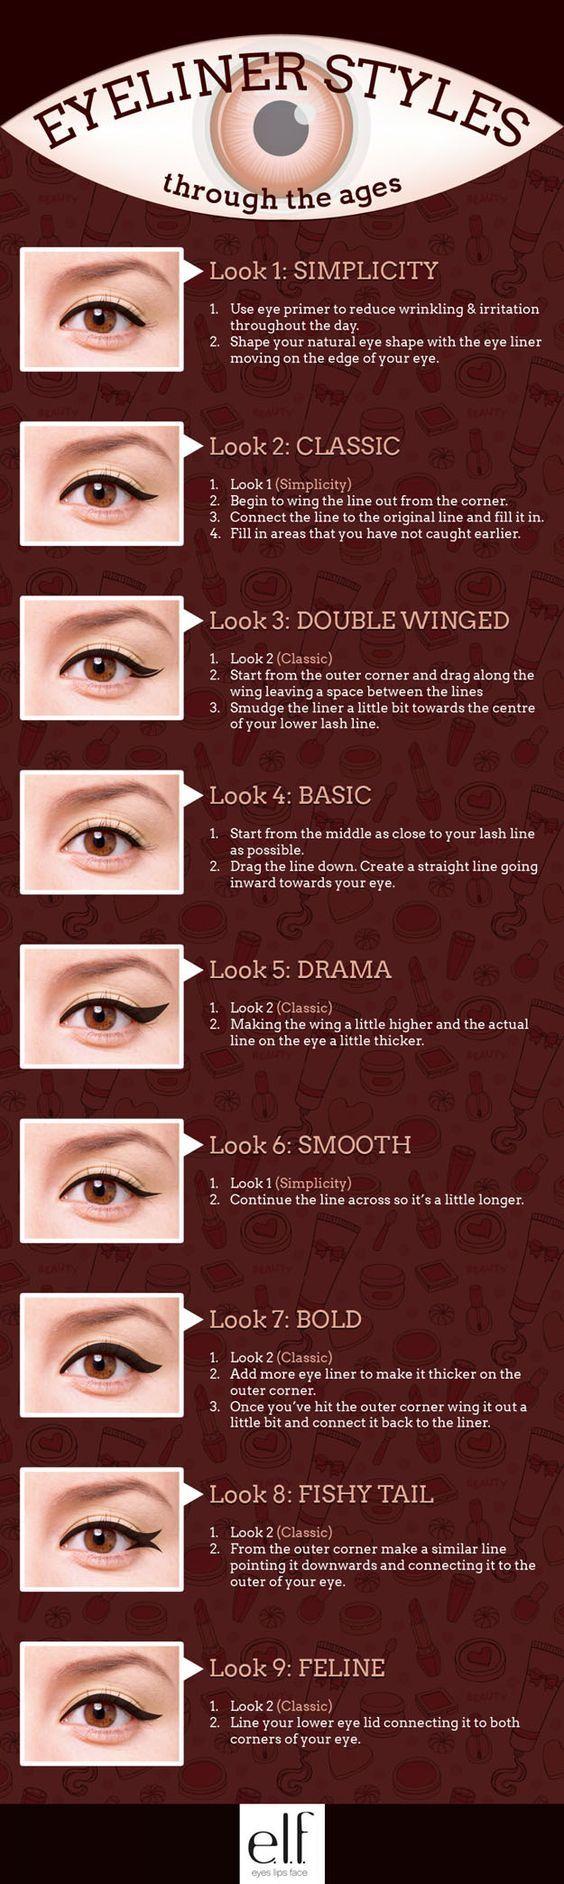 Simple Eyeliner Tutorials for Perfect Eyeliner Looks by Makeup Tutorials at http://makeuptutorials.com/makeup-tutorials-beauty-tips: